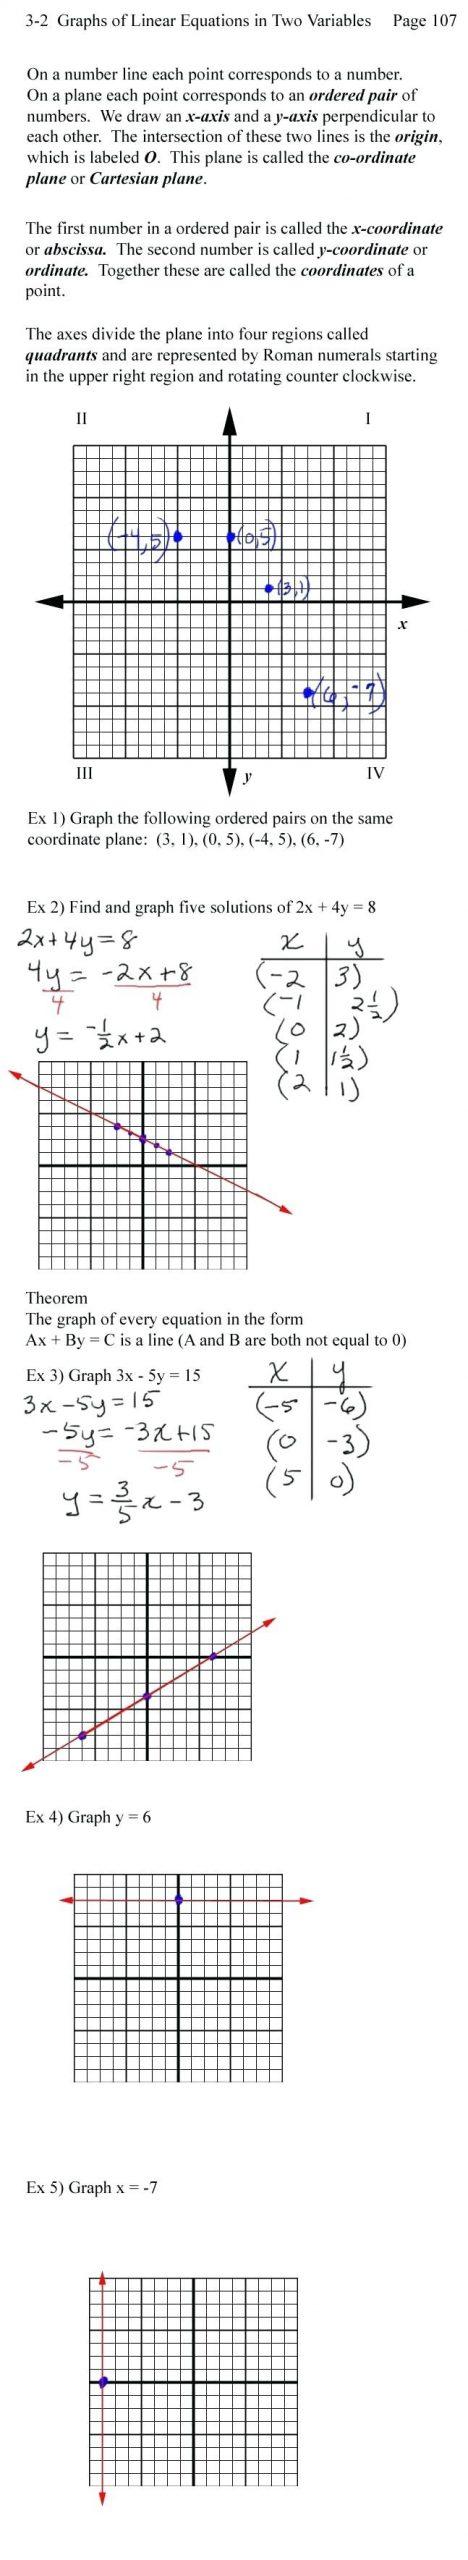 Graphing Linear Inequalities Worksheet Graphing Linear Inequalities Worksheet Promotiontablecovers